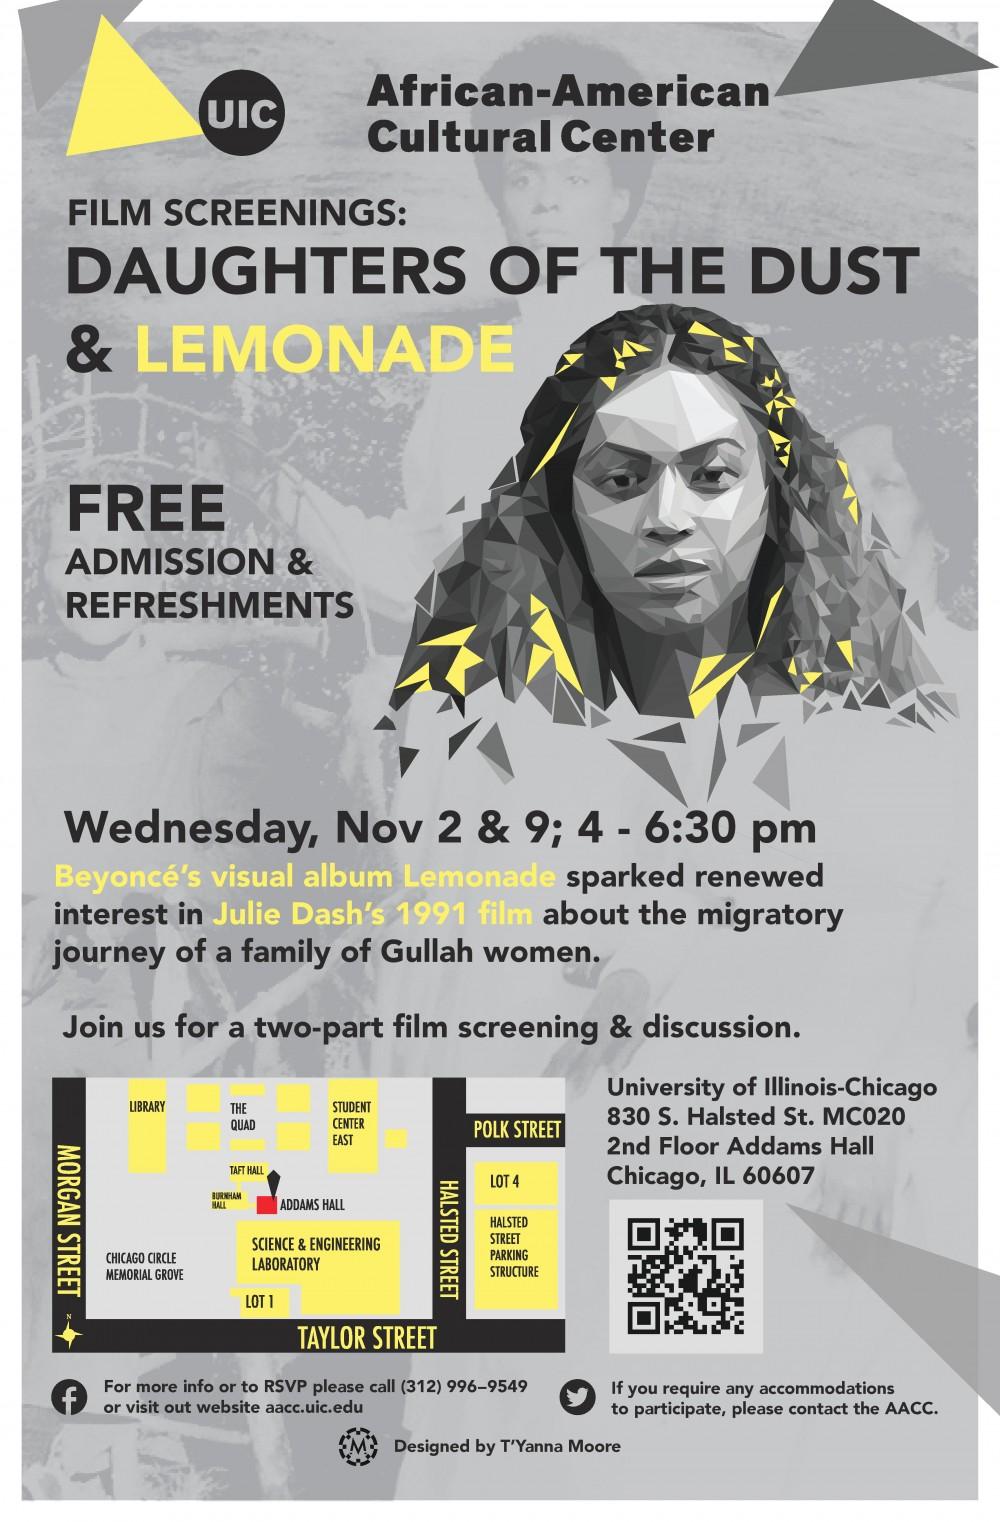 Daughters of the Dust & Lemonade